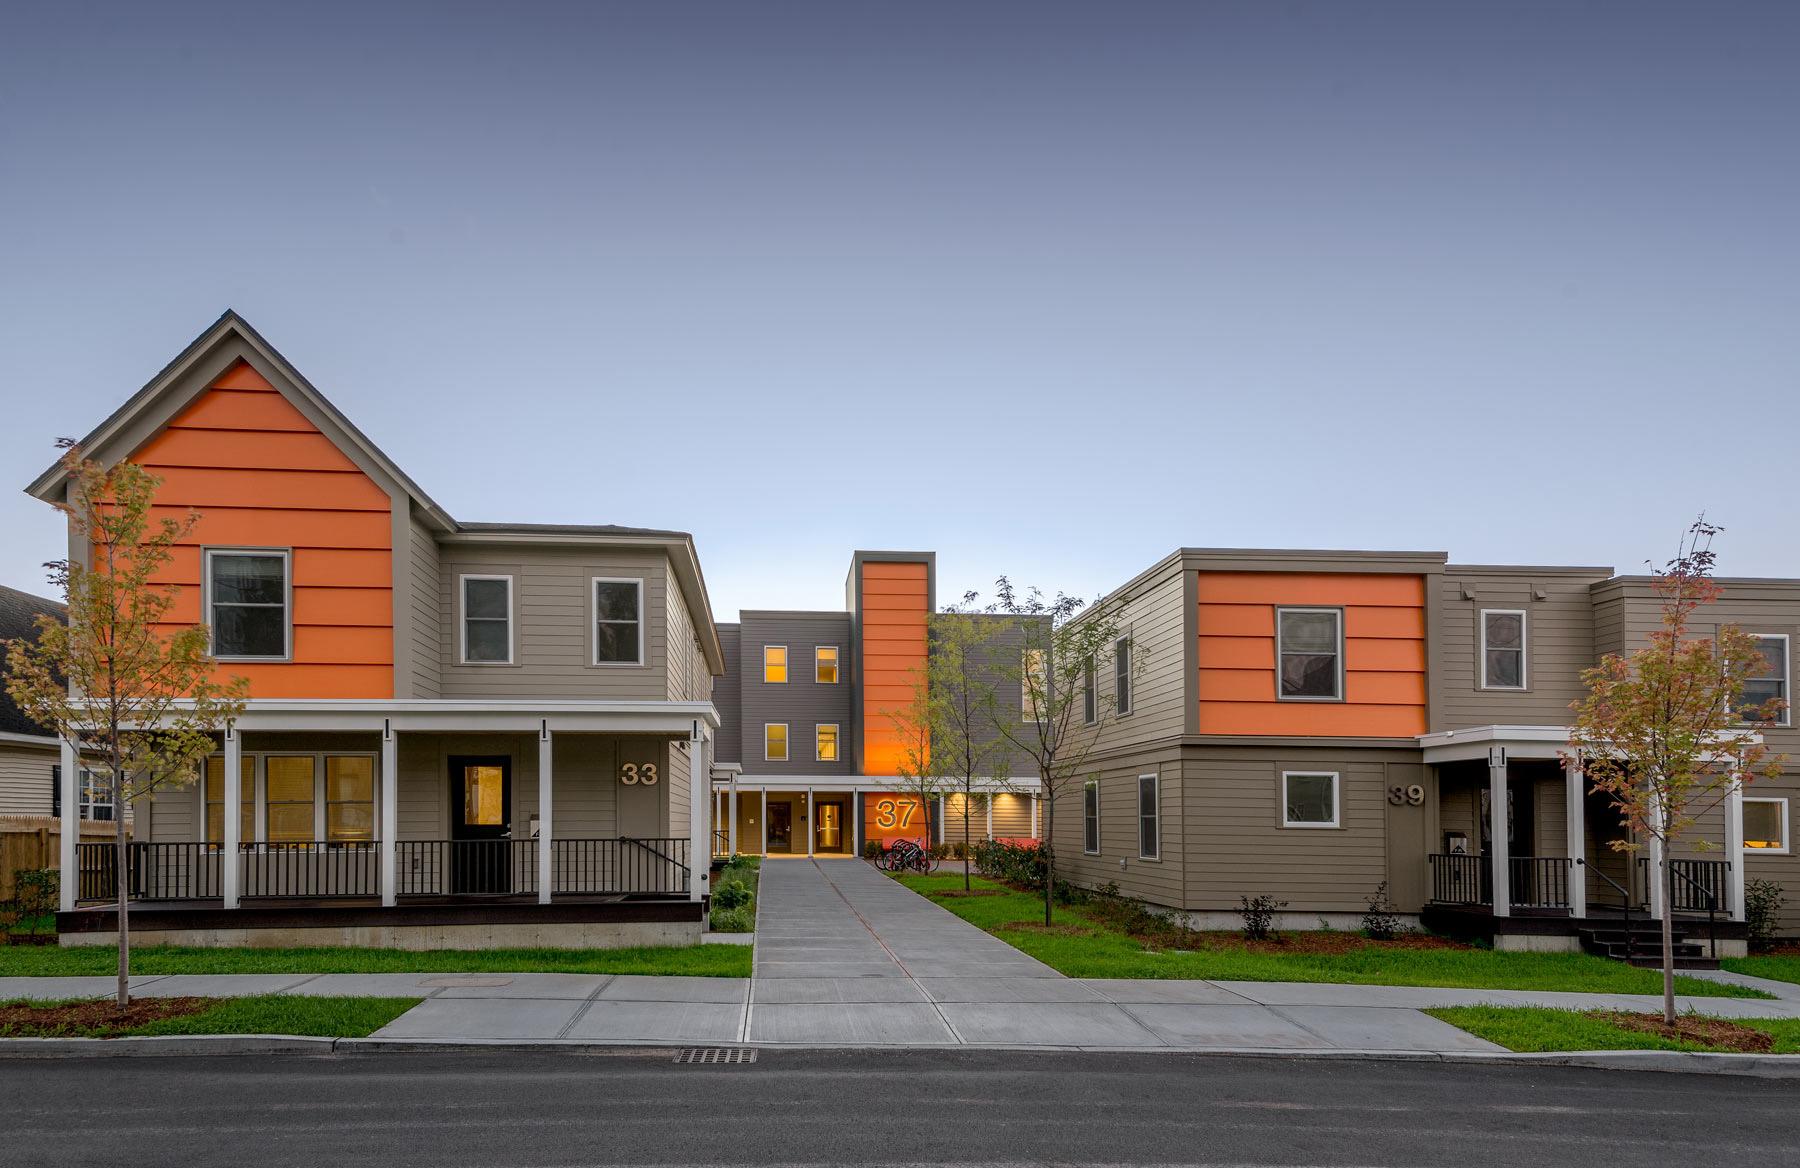 Bright Street Cooperative Housing \u2014 Duncan Wisniewski Architecture